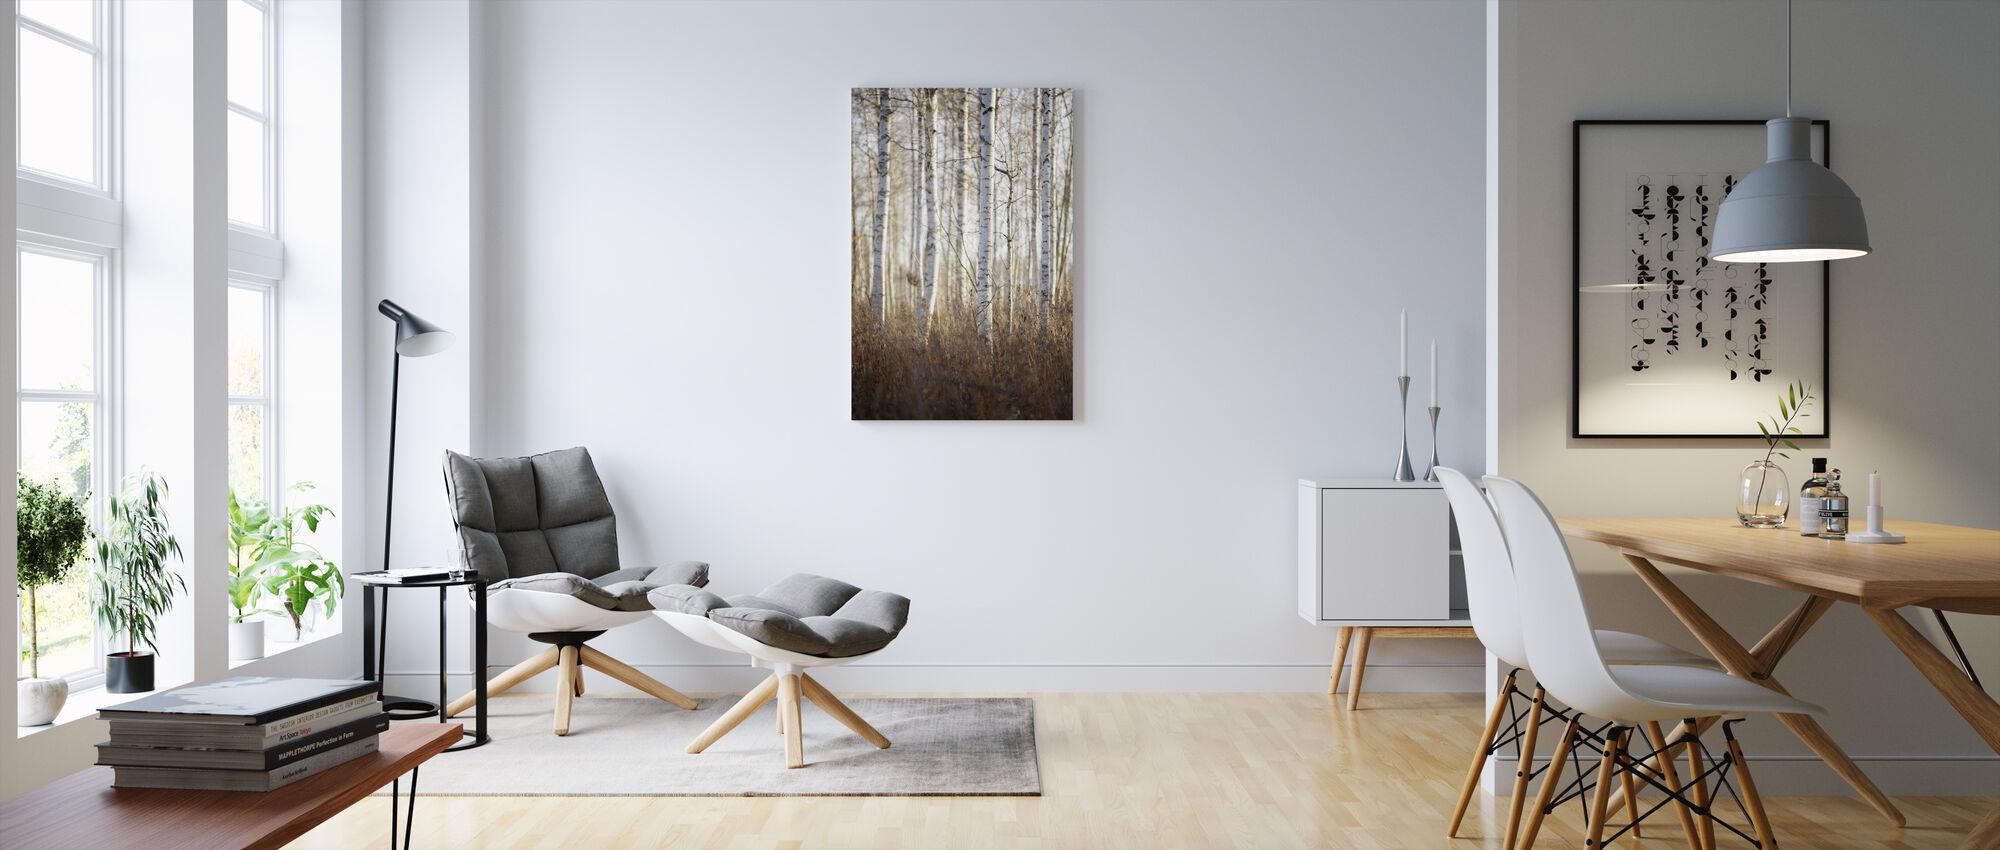 Bjørkeskog i Dalarna, Sverige, Europa - Lerretsbilde - Stue